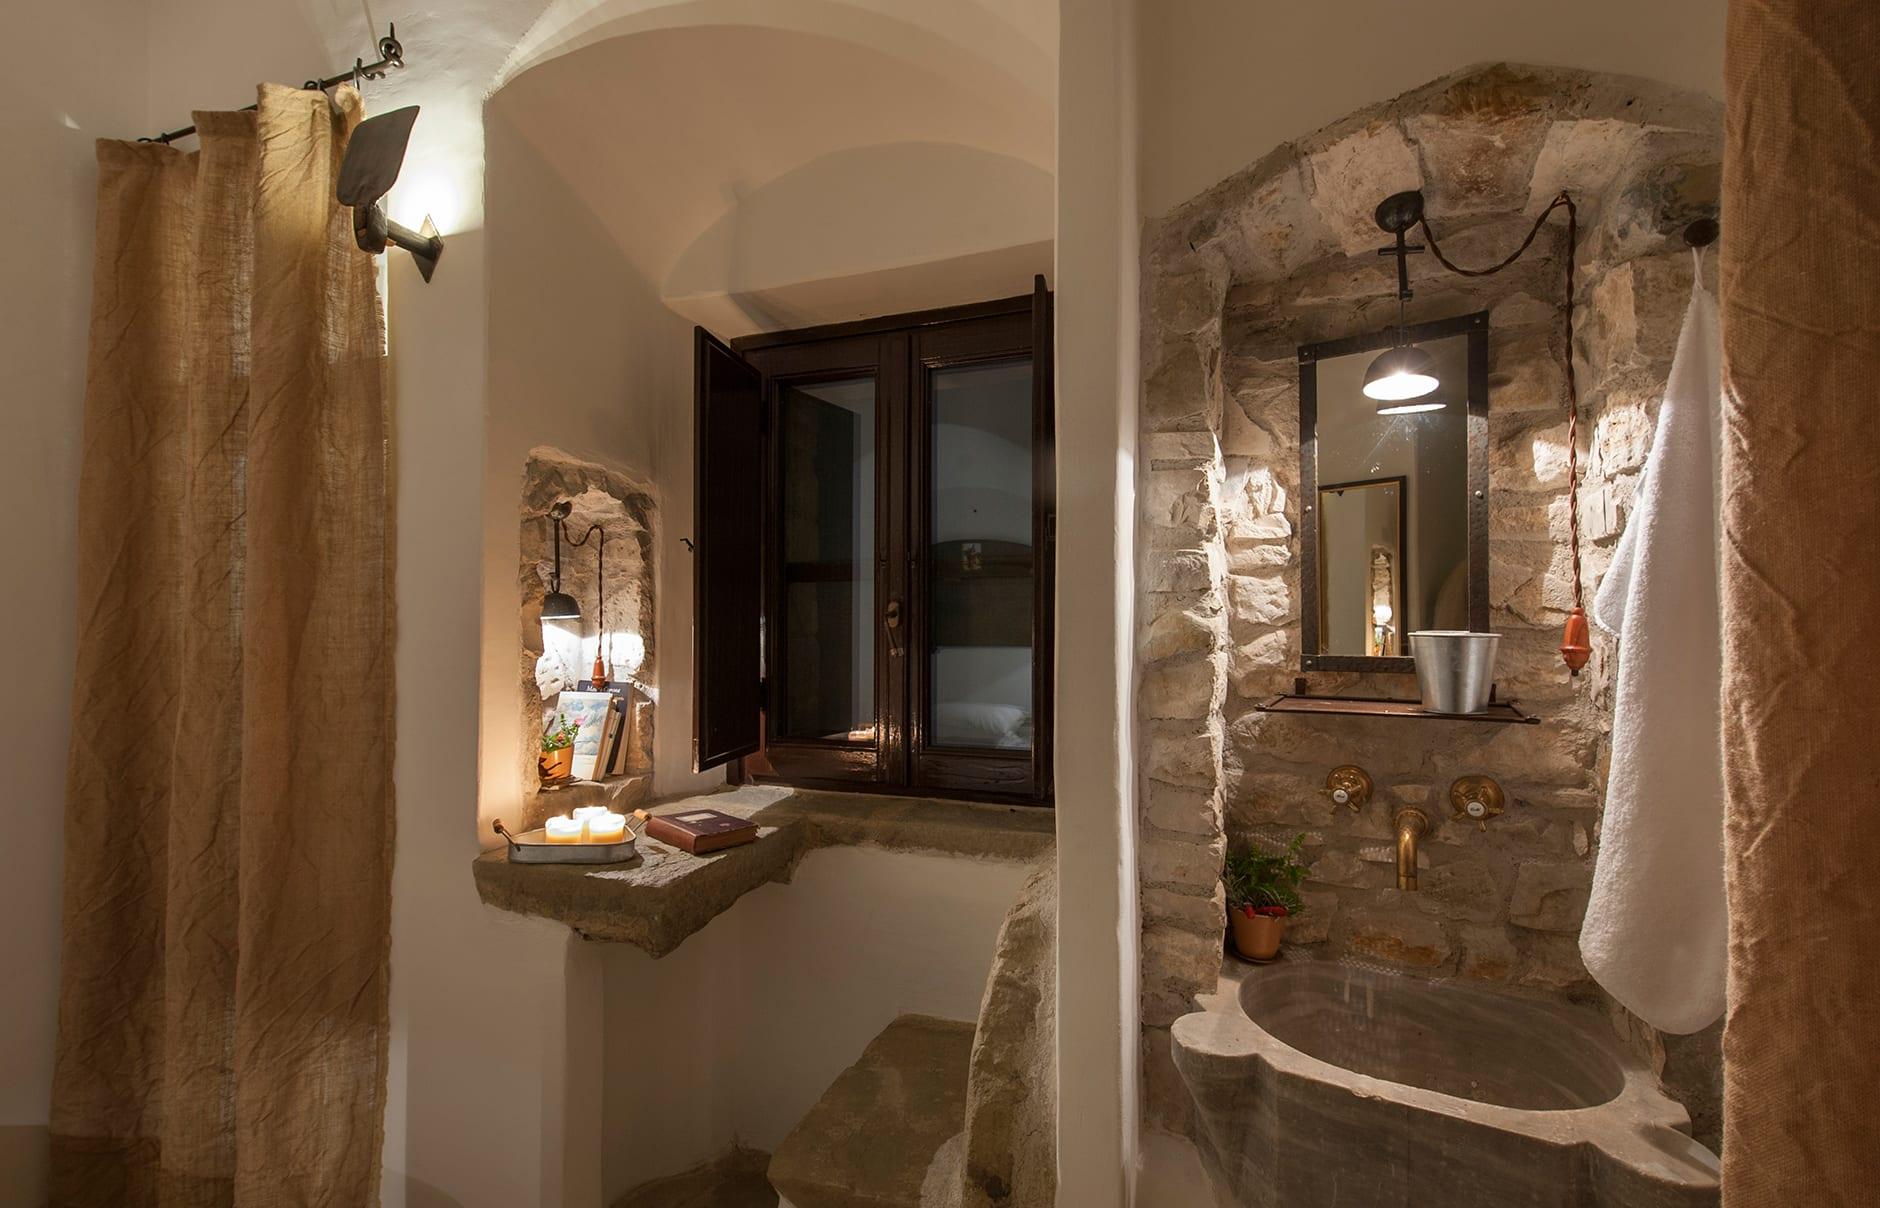 Eremito Hotelito del Alma, Tarina, Parrano, Italy. © Eremito Hotelito del Alma, Italy